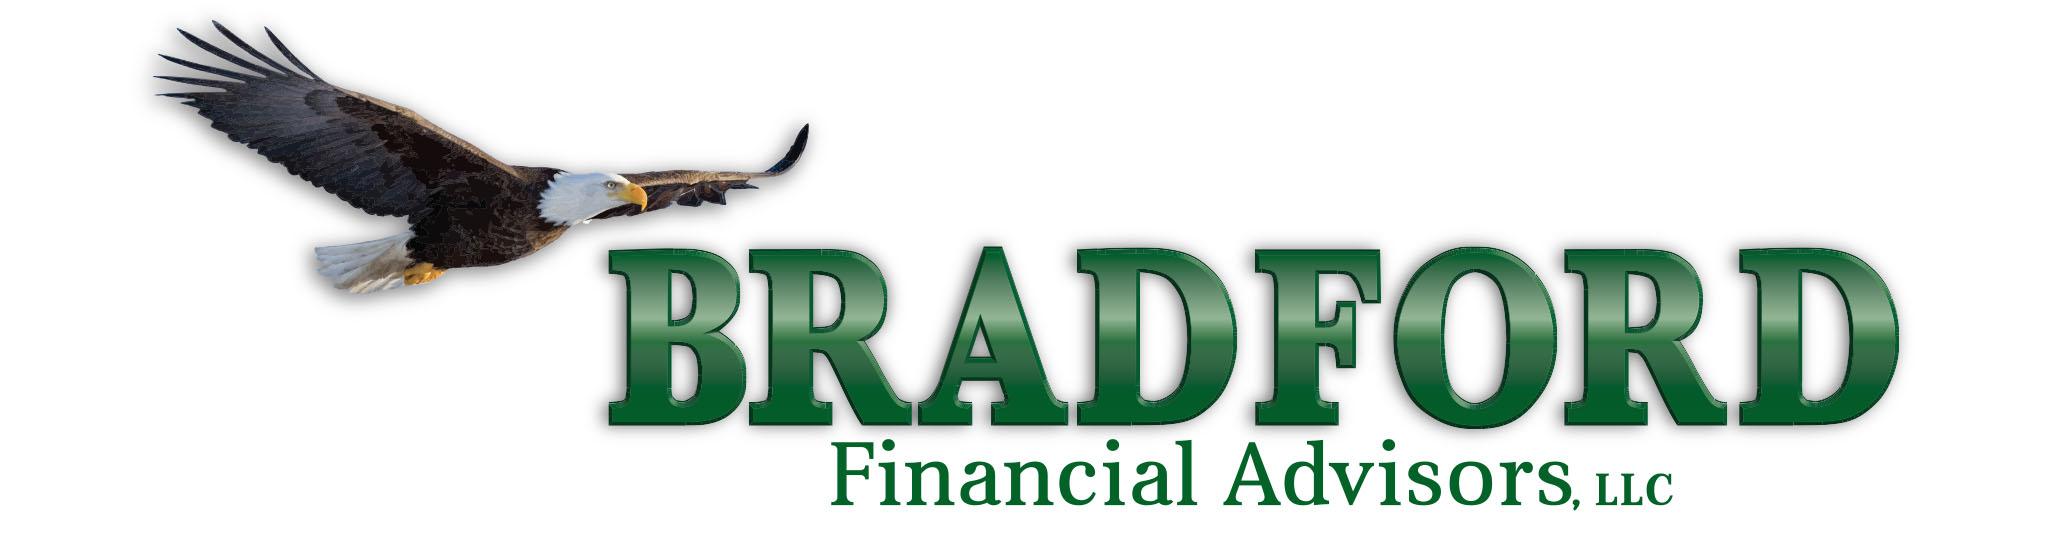 BradfordFAFINAL Logo022415.jpg